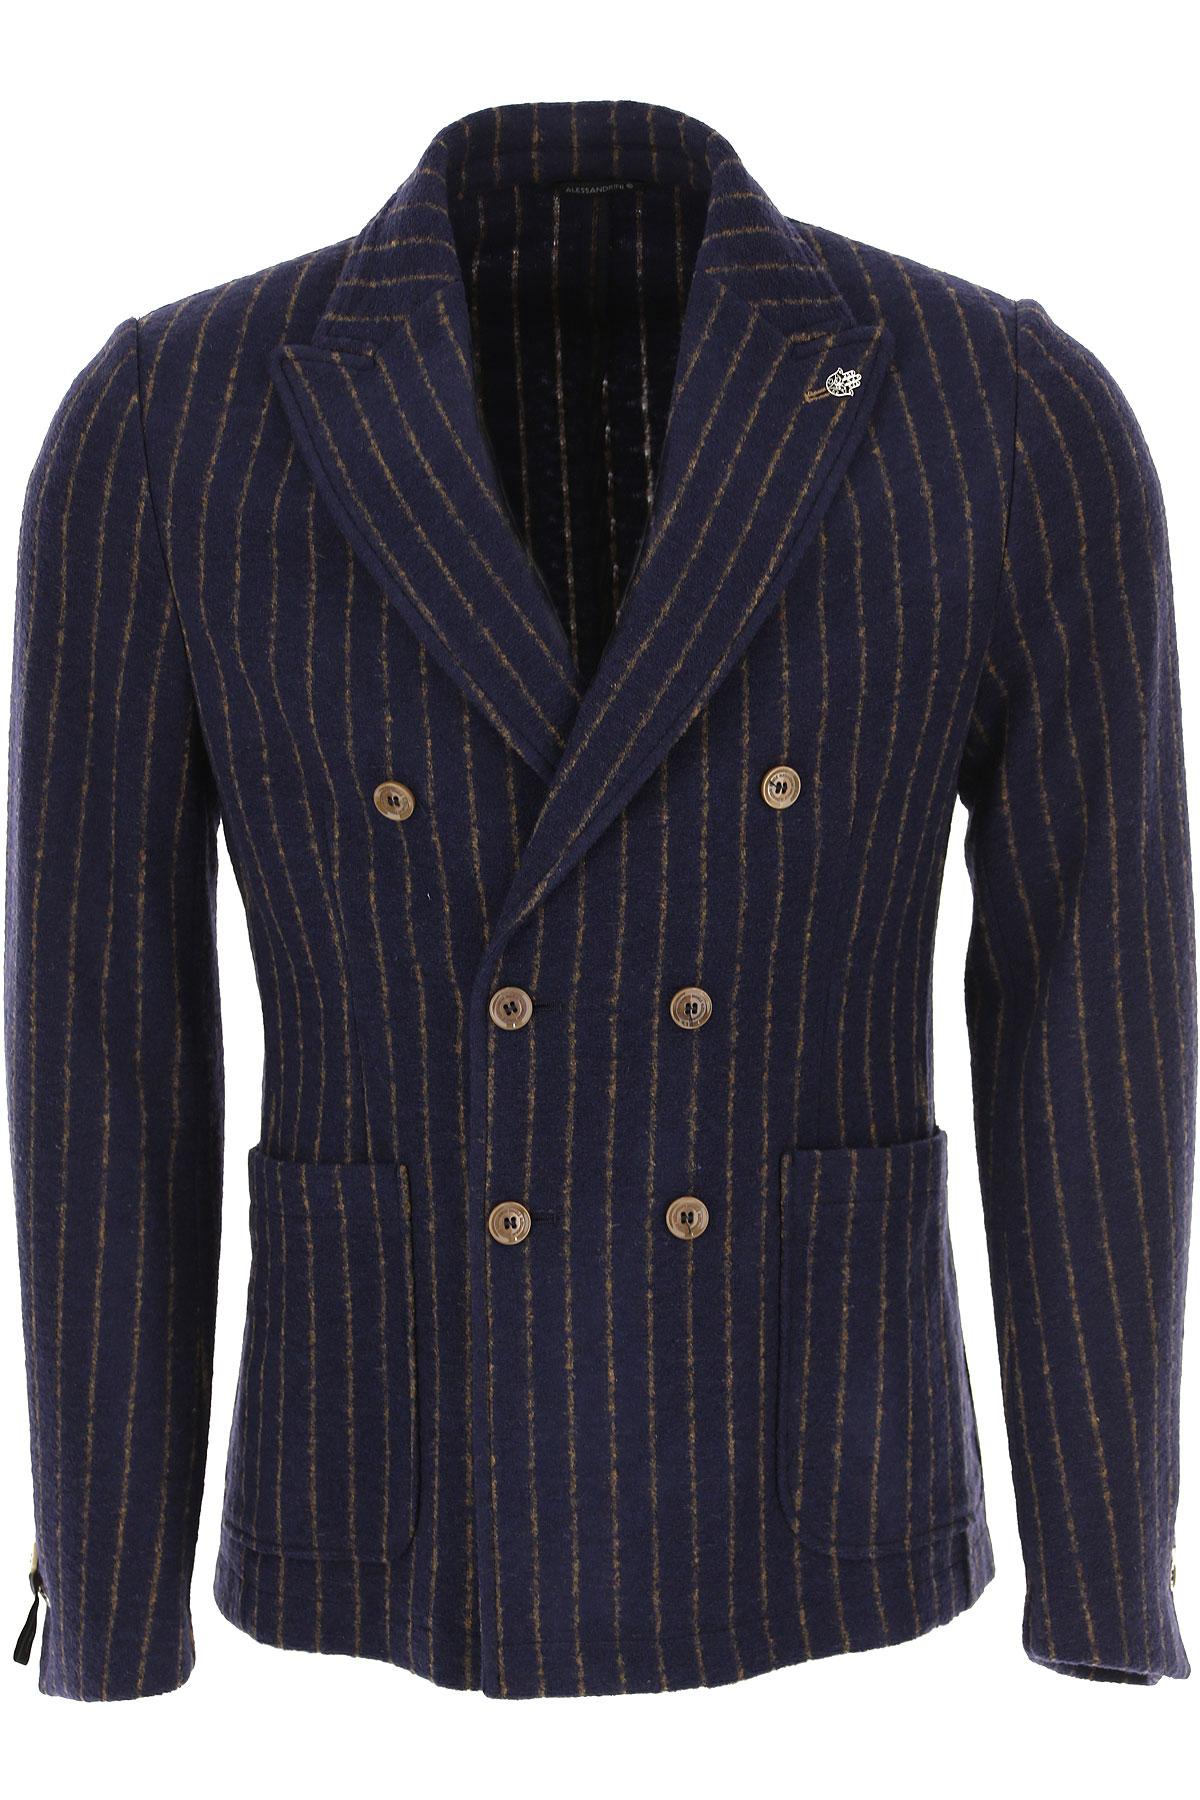 Daniele Alessandrini Blazer for Men, Sport Coat On Sale, Navy Blue, Acrylic, 2019, L M XL